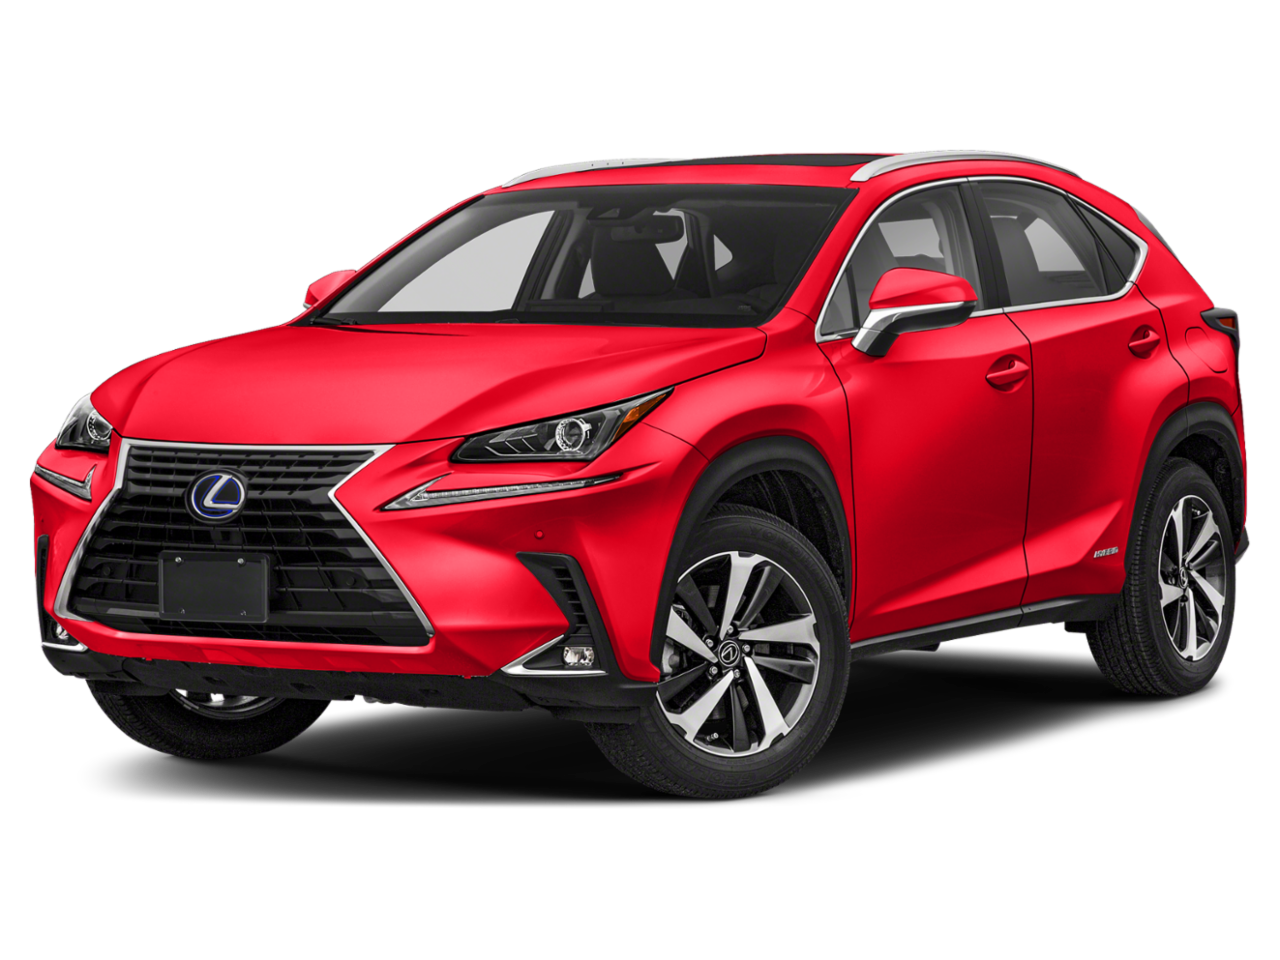 check out the 2020 nx 300h awd on lg&e and ku cars